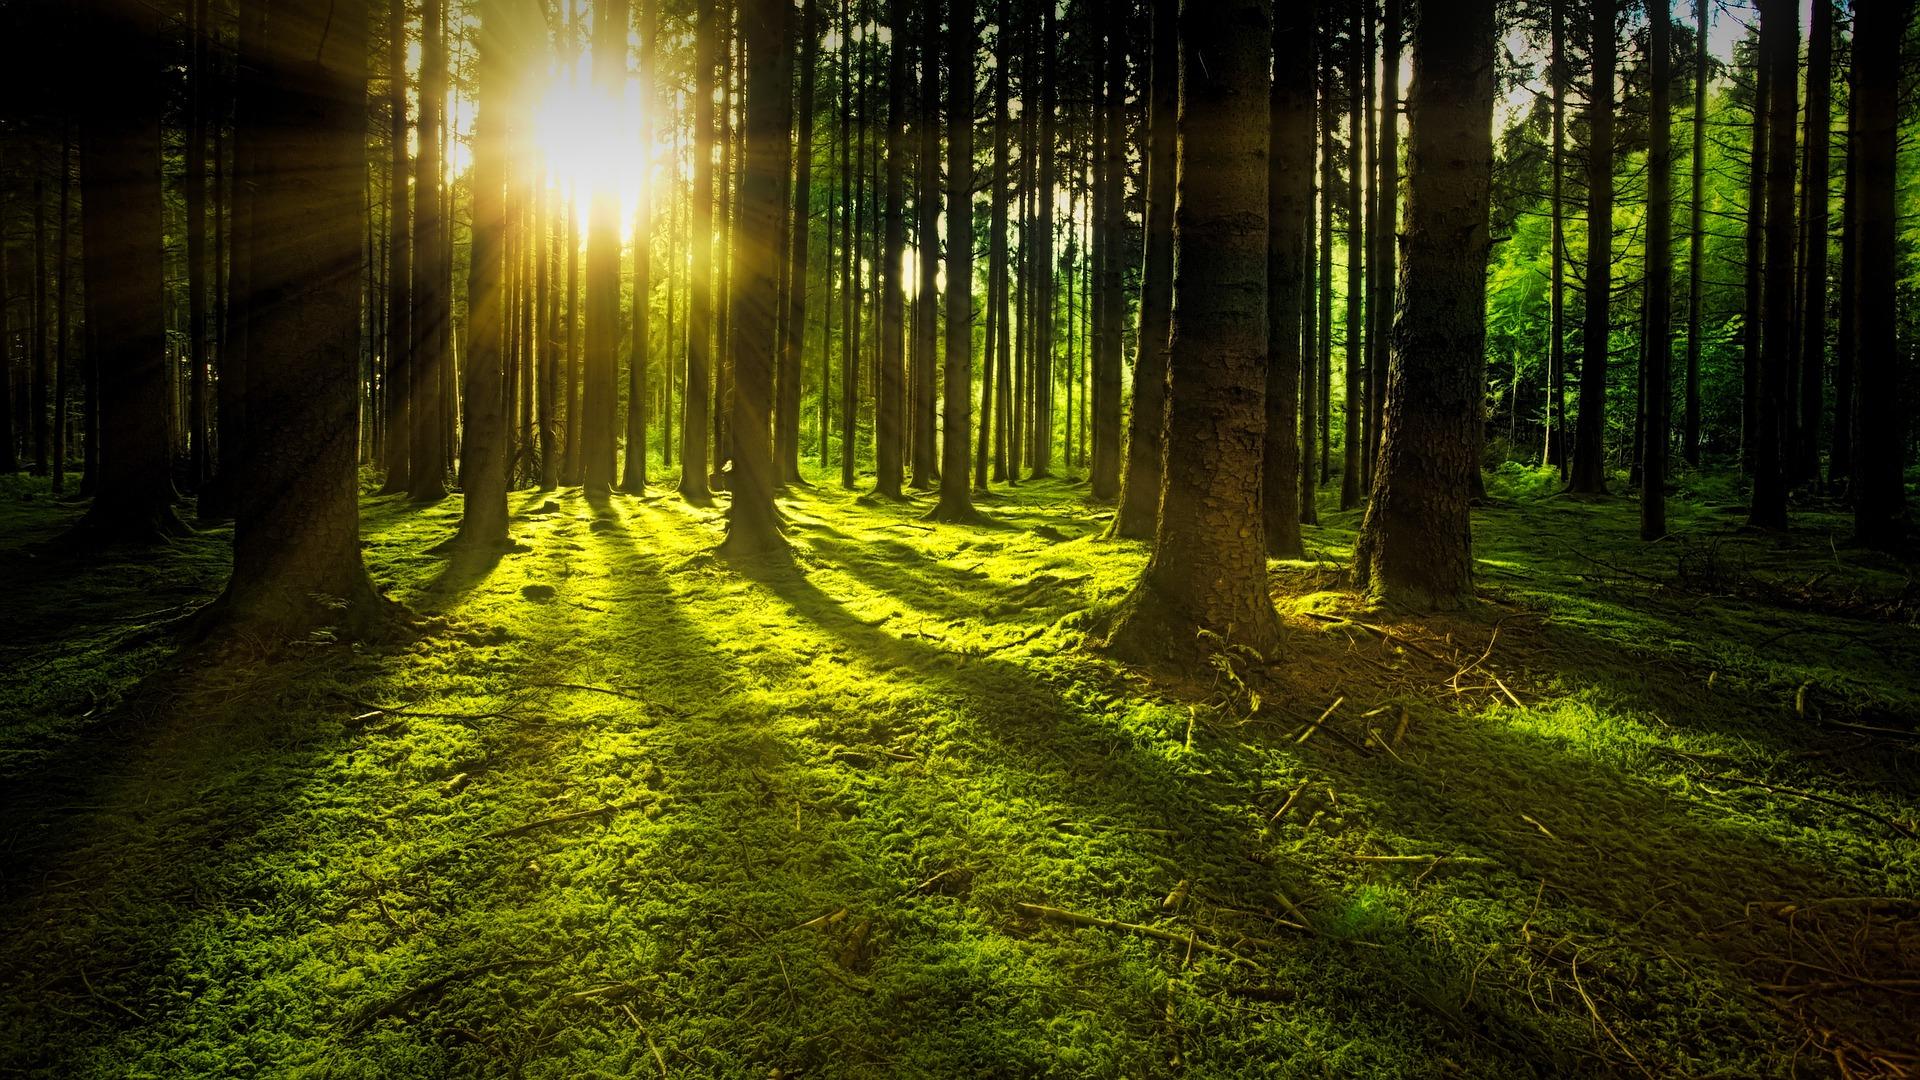 soleil forêt rayons lumière